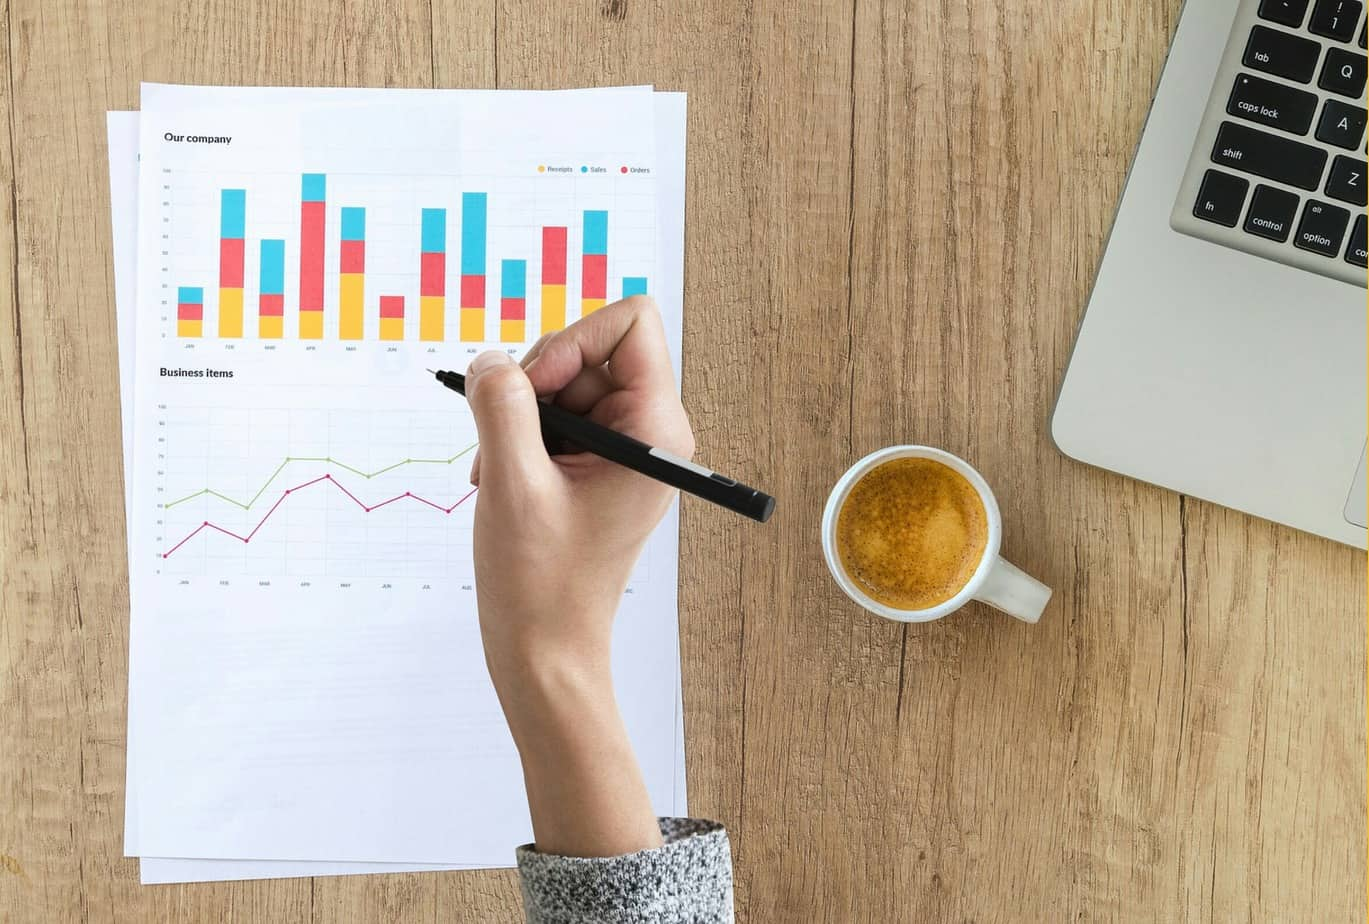 Statistik, Frauen, Männer, Gründer, Existenzgründer, Startups, Start Up, Auswertung, Hand, Kaffee, Computer, Tisch